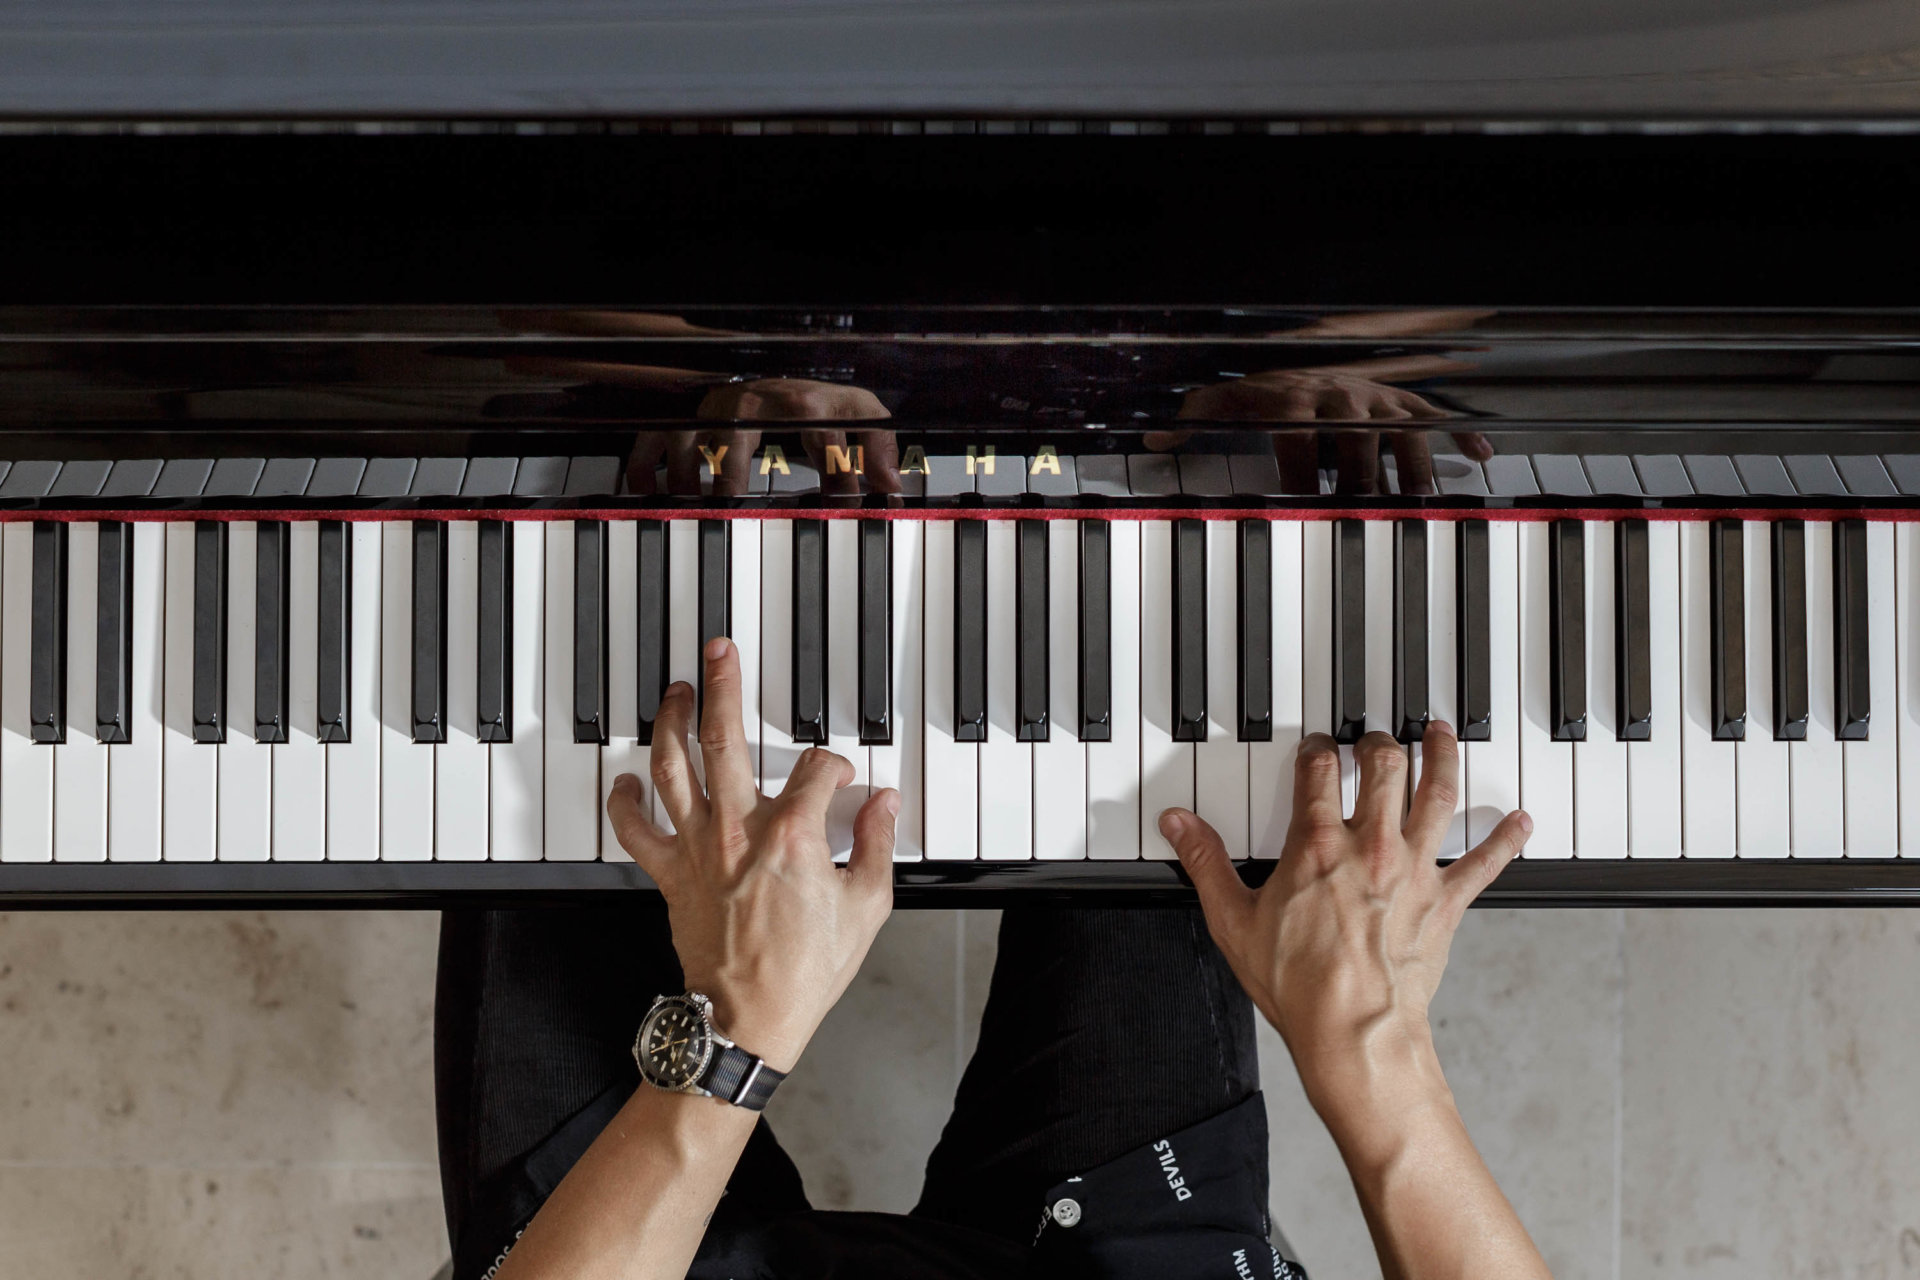 Jamie Cullum, Jazzopen Stuttgart, Serie, klavier, meisterfinger, musik, piano, tasten